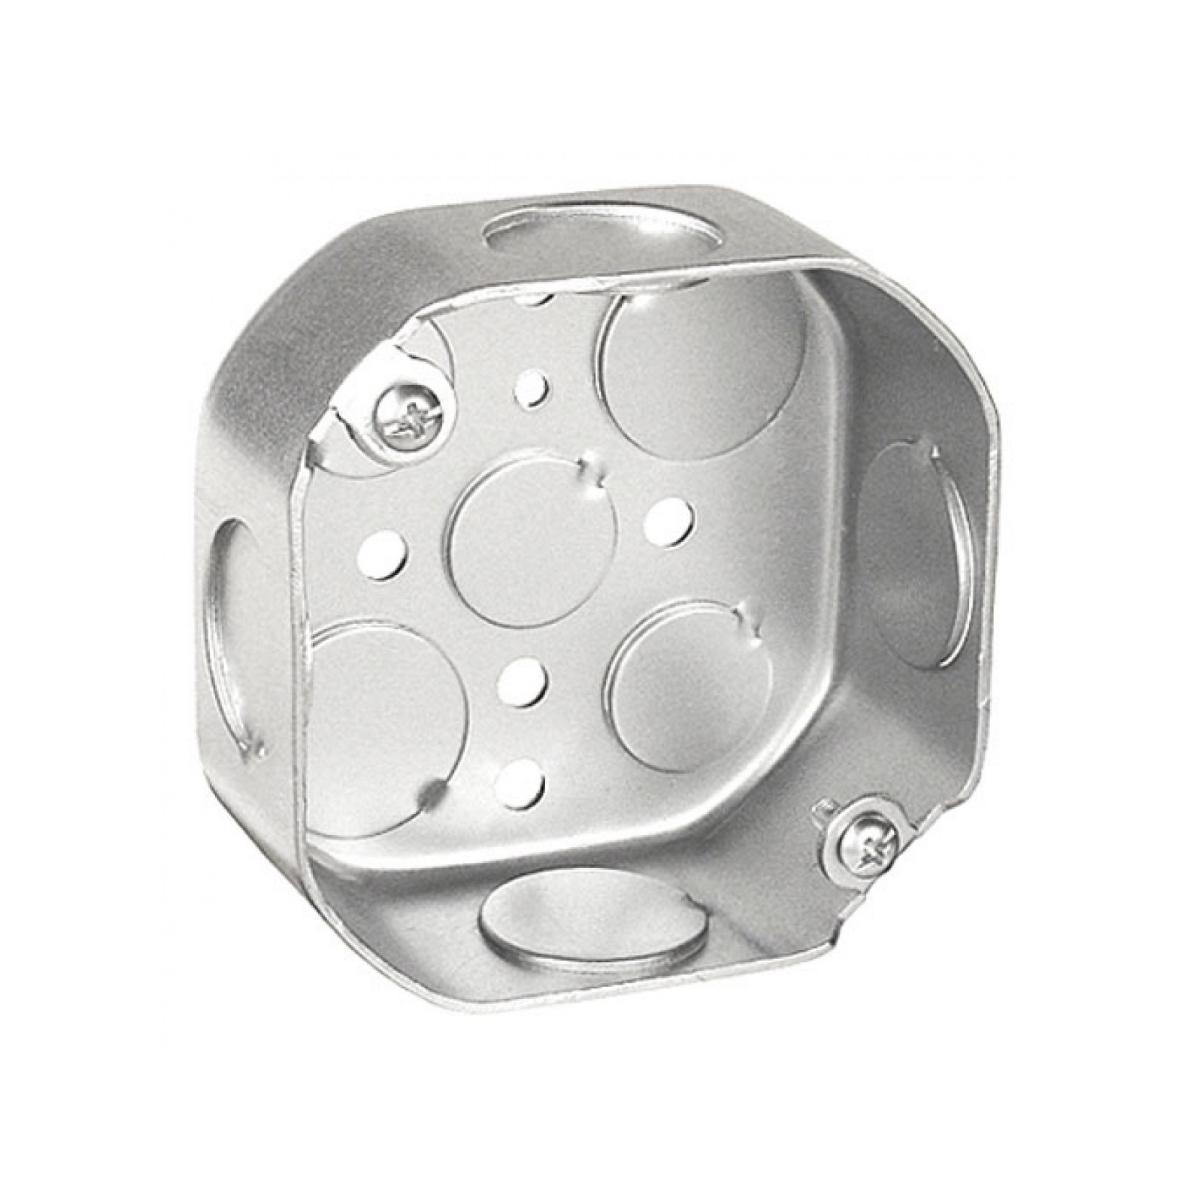 Topaz G4452, 4″ Octagon Drawn Boxes 1-1/2″ deep 3/4″ KO, Galvanized Steel